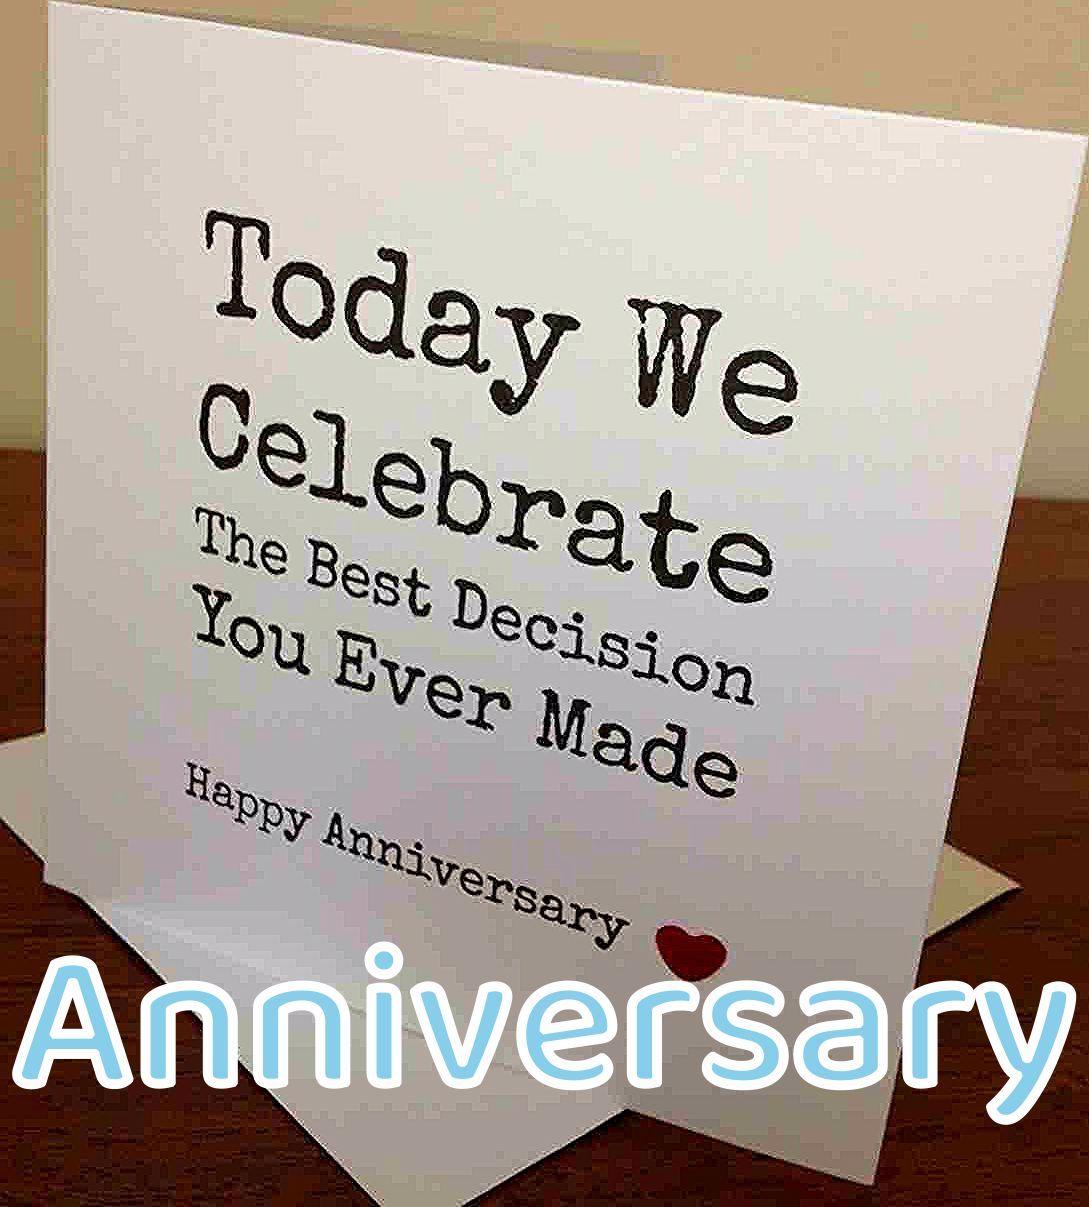 23Rd Wedding Anniversary Gift Ideas Husband 23rd